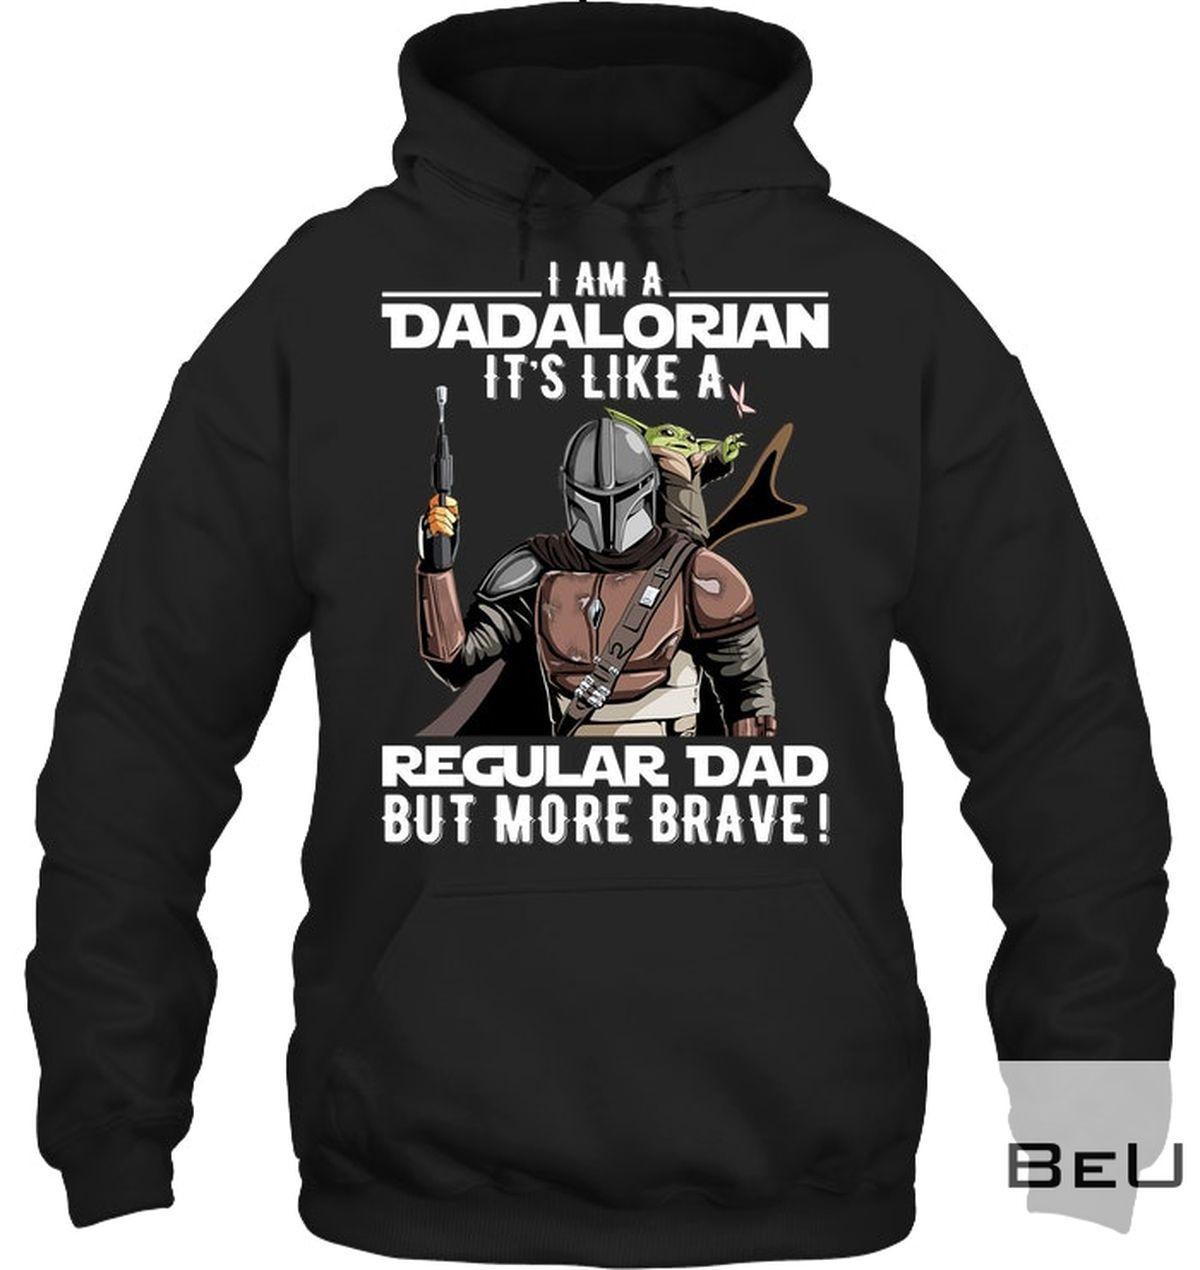 I Am A Dadalorian It's Like A Regular Dad But More Brave Shirtz